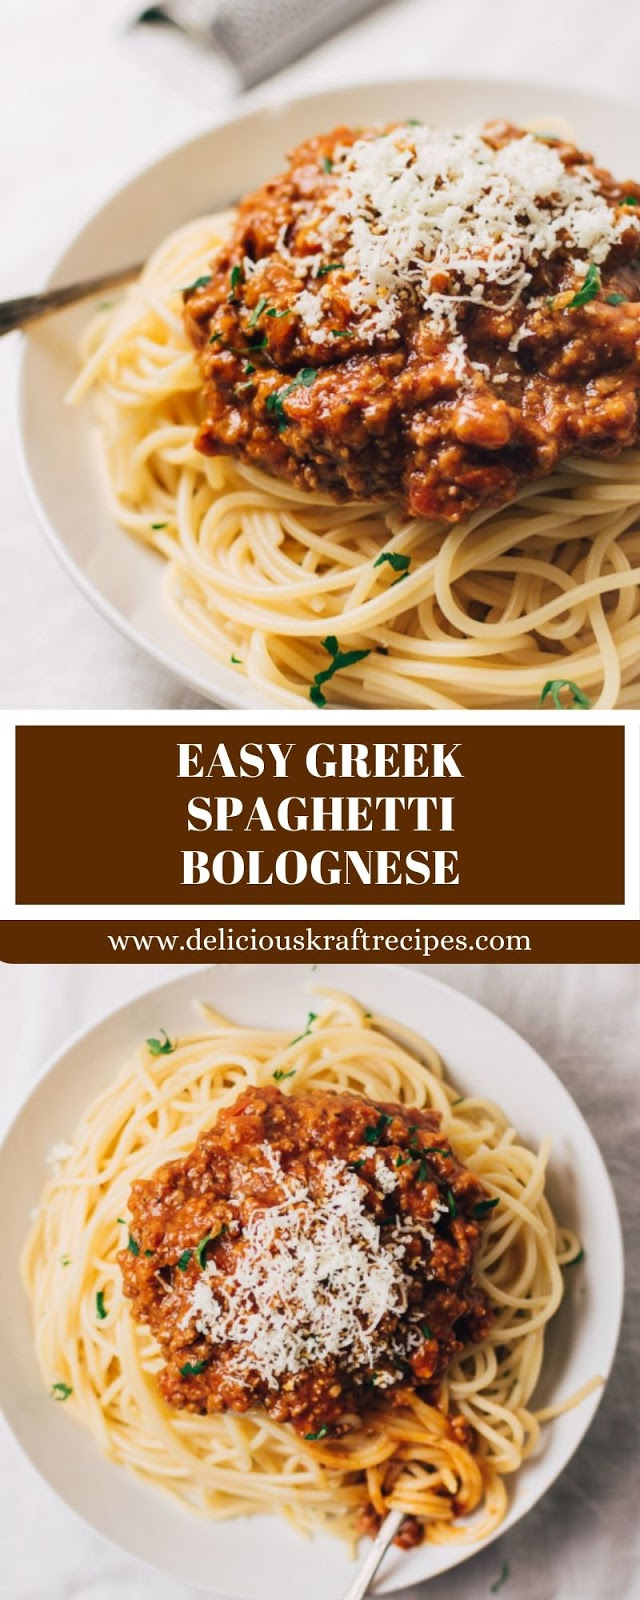 EASY GREEK SPAGHETTI BOLOGNESE